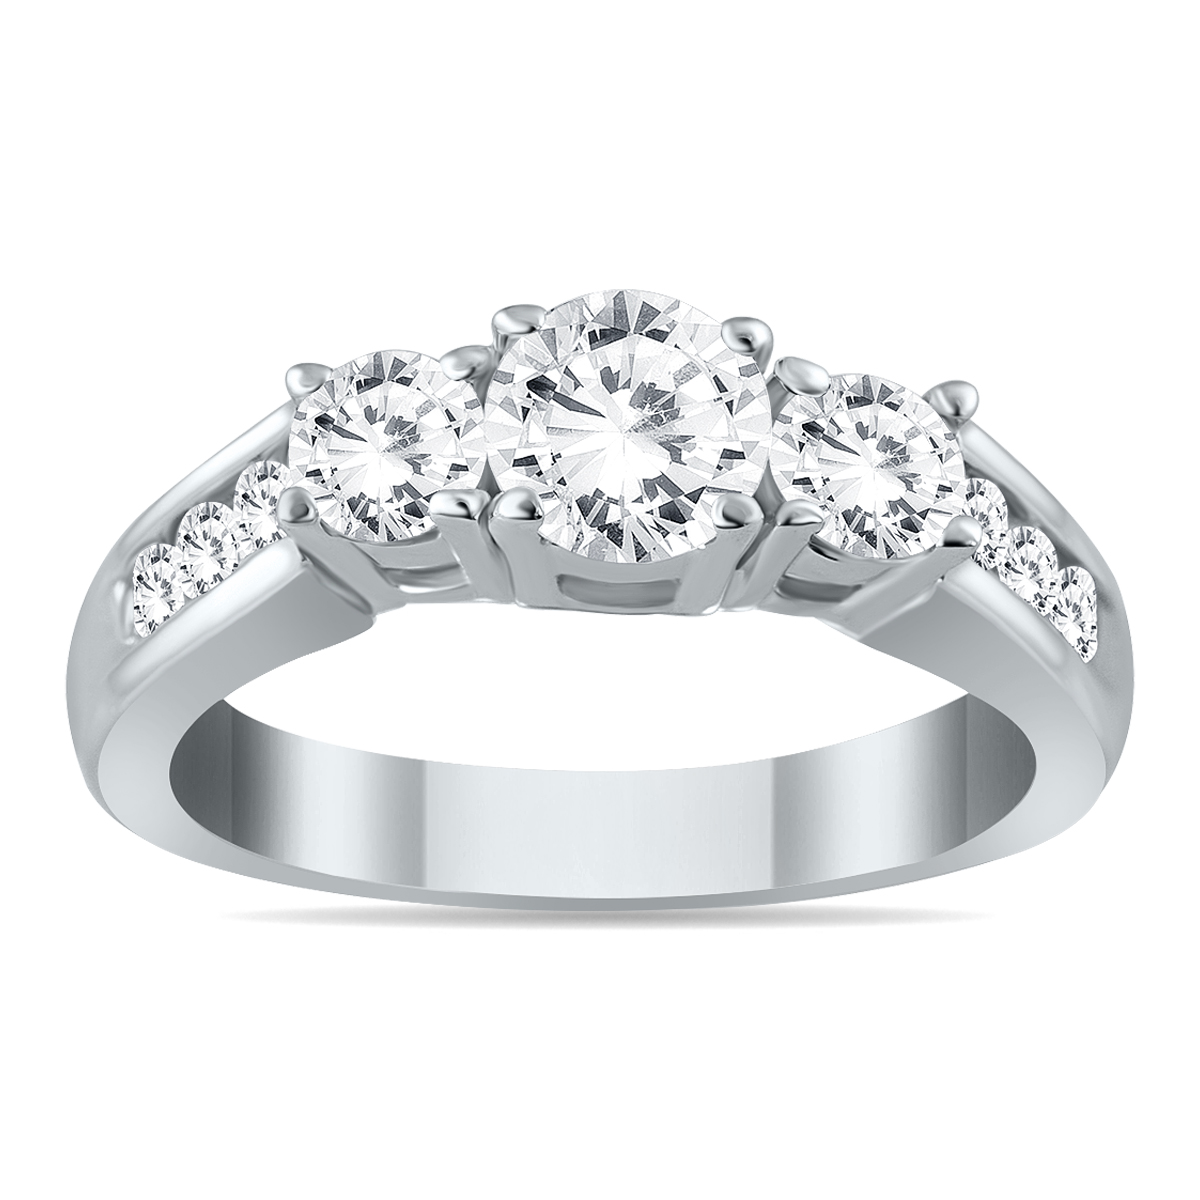 1 1/2 Carat TW Diamond Three Stone